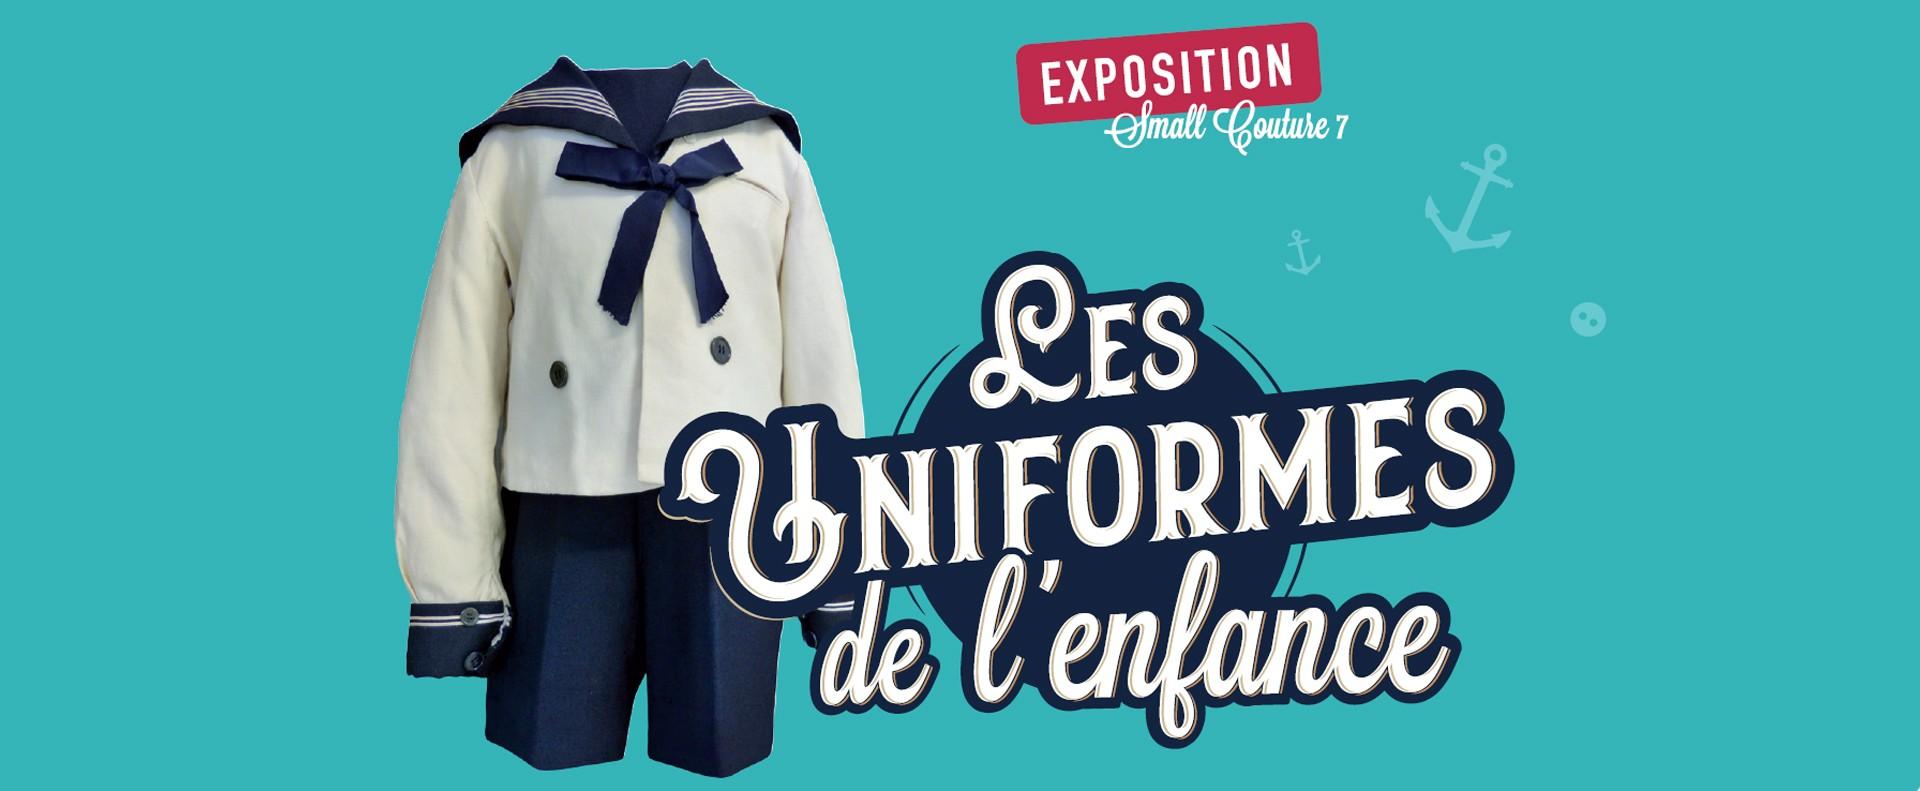 actu-small-couture-7-1155